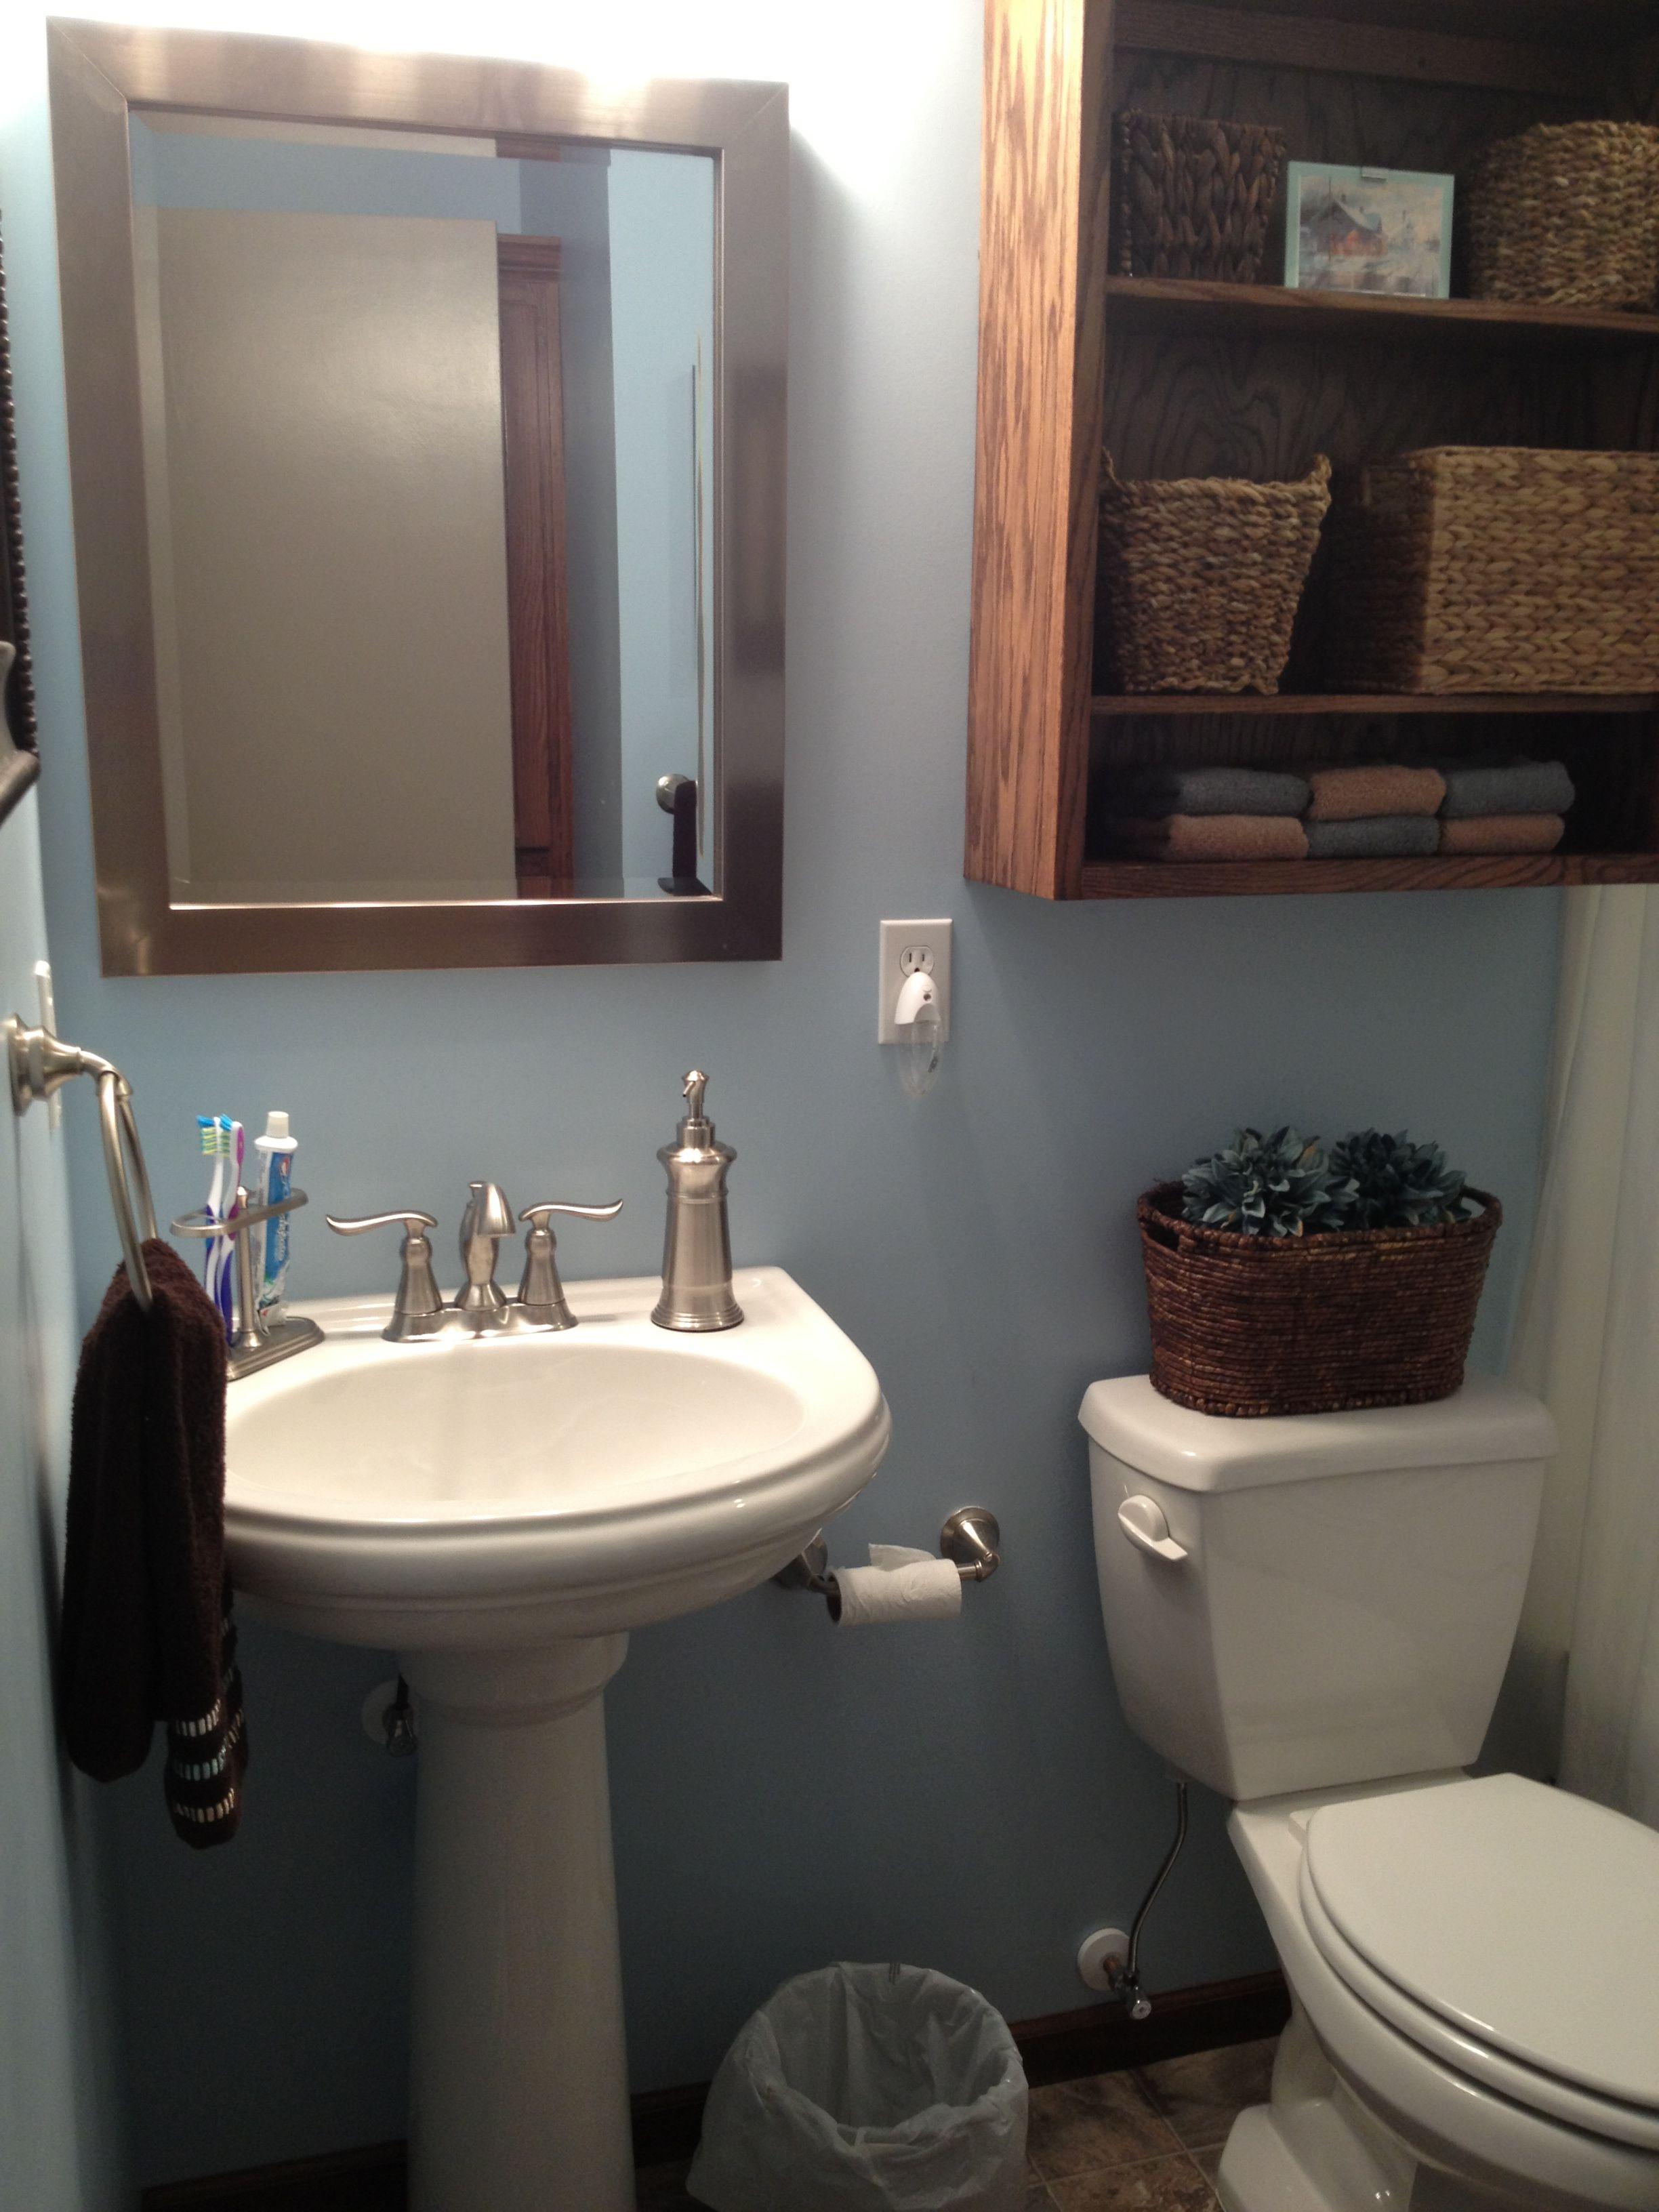 Small Bathroom Remodel Gerber Brianne Pedestal Sink and Gerber